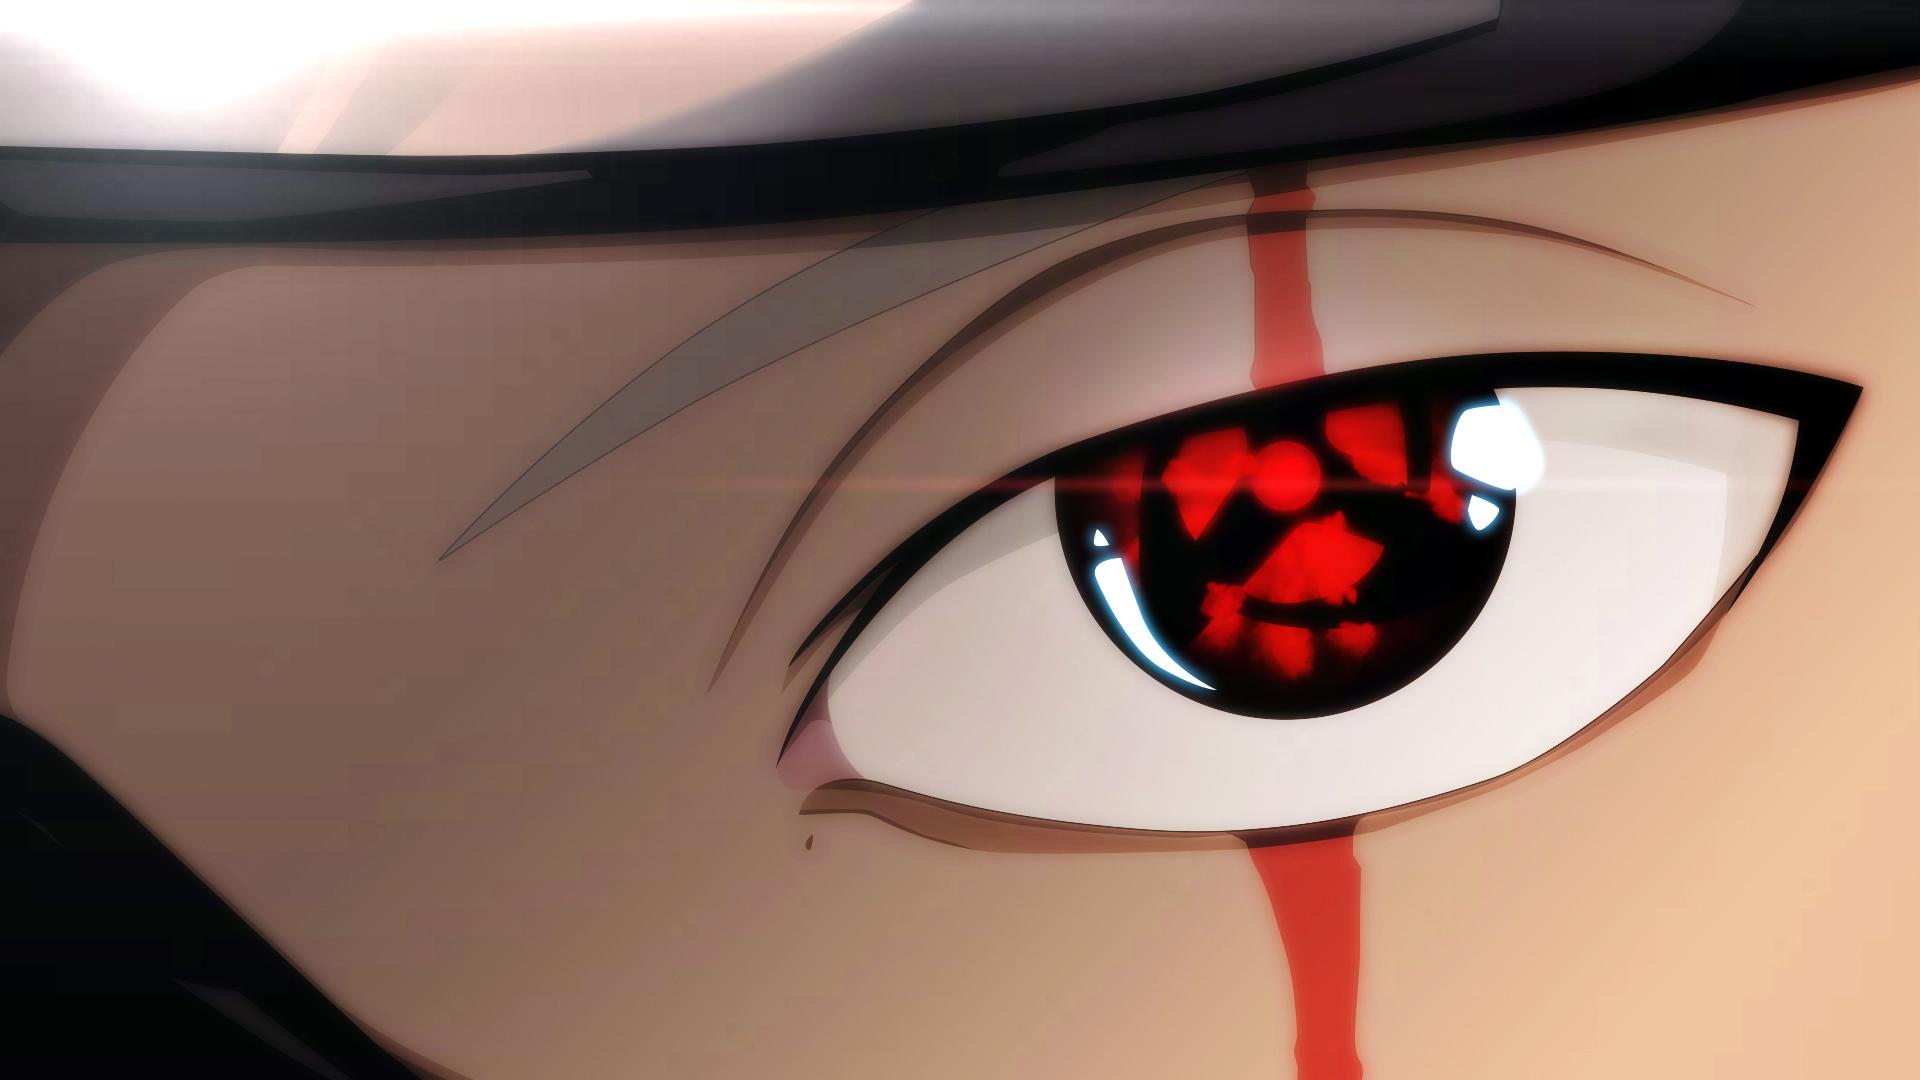 Hd wallpaper kakashi - Hatake Kakashi Sharingan Eye